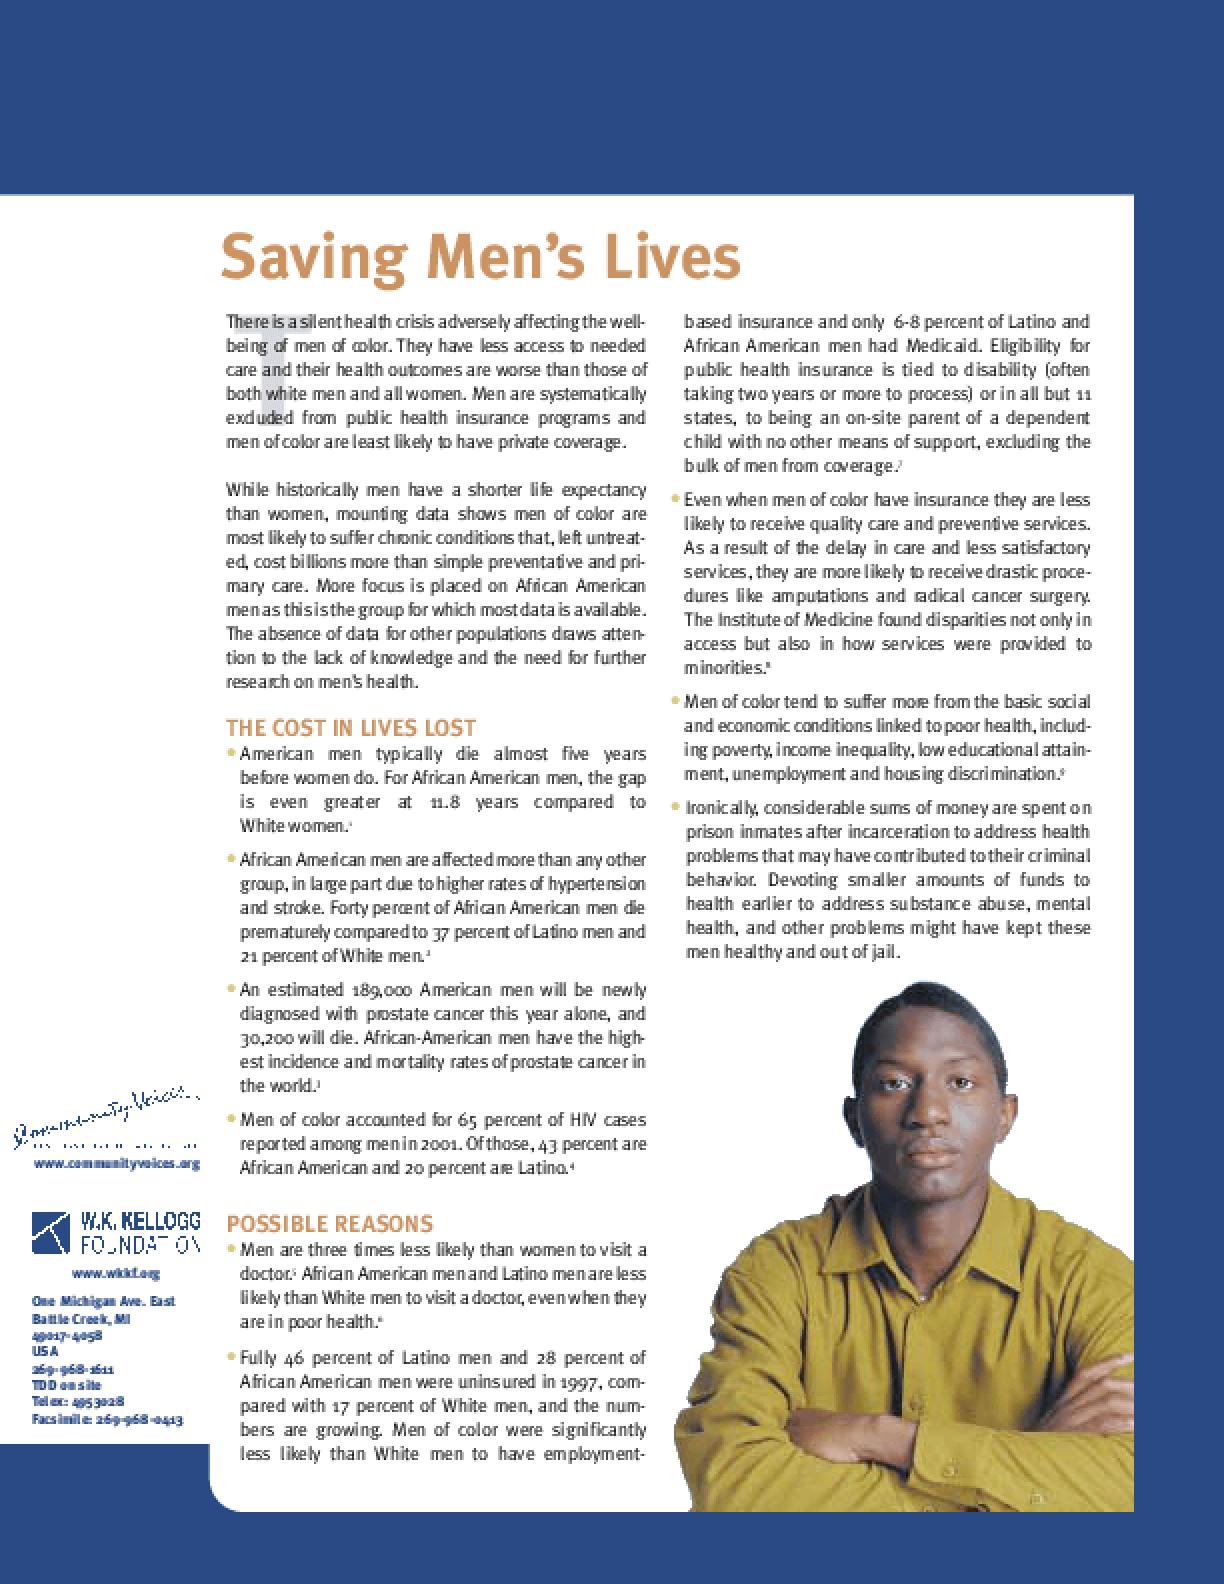 Saving Men's Lives